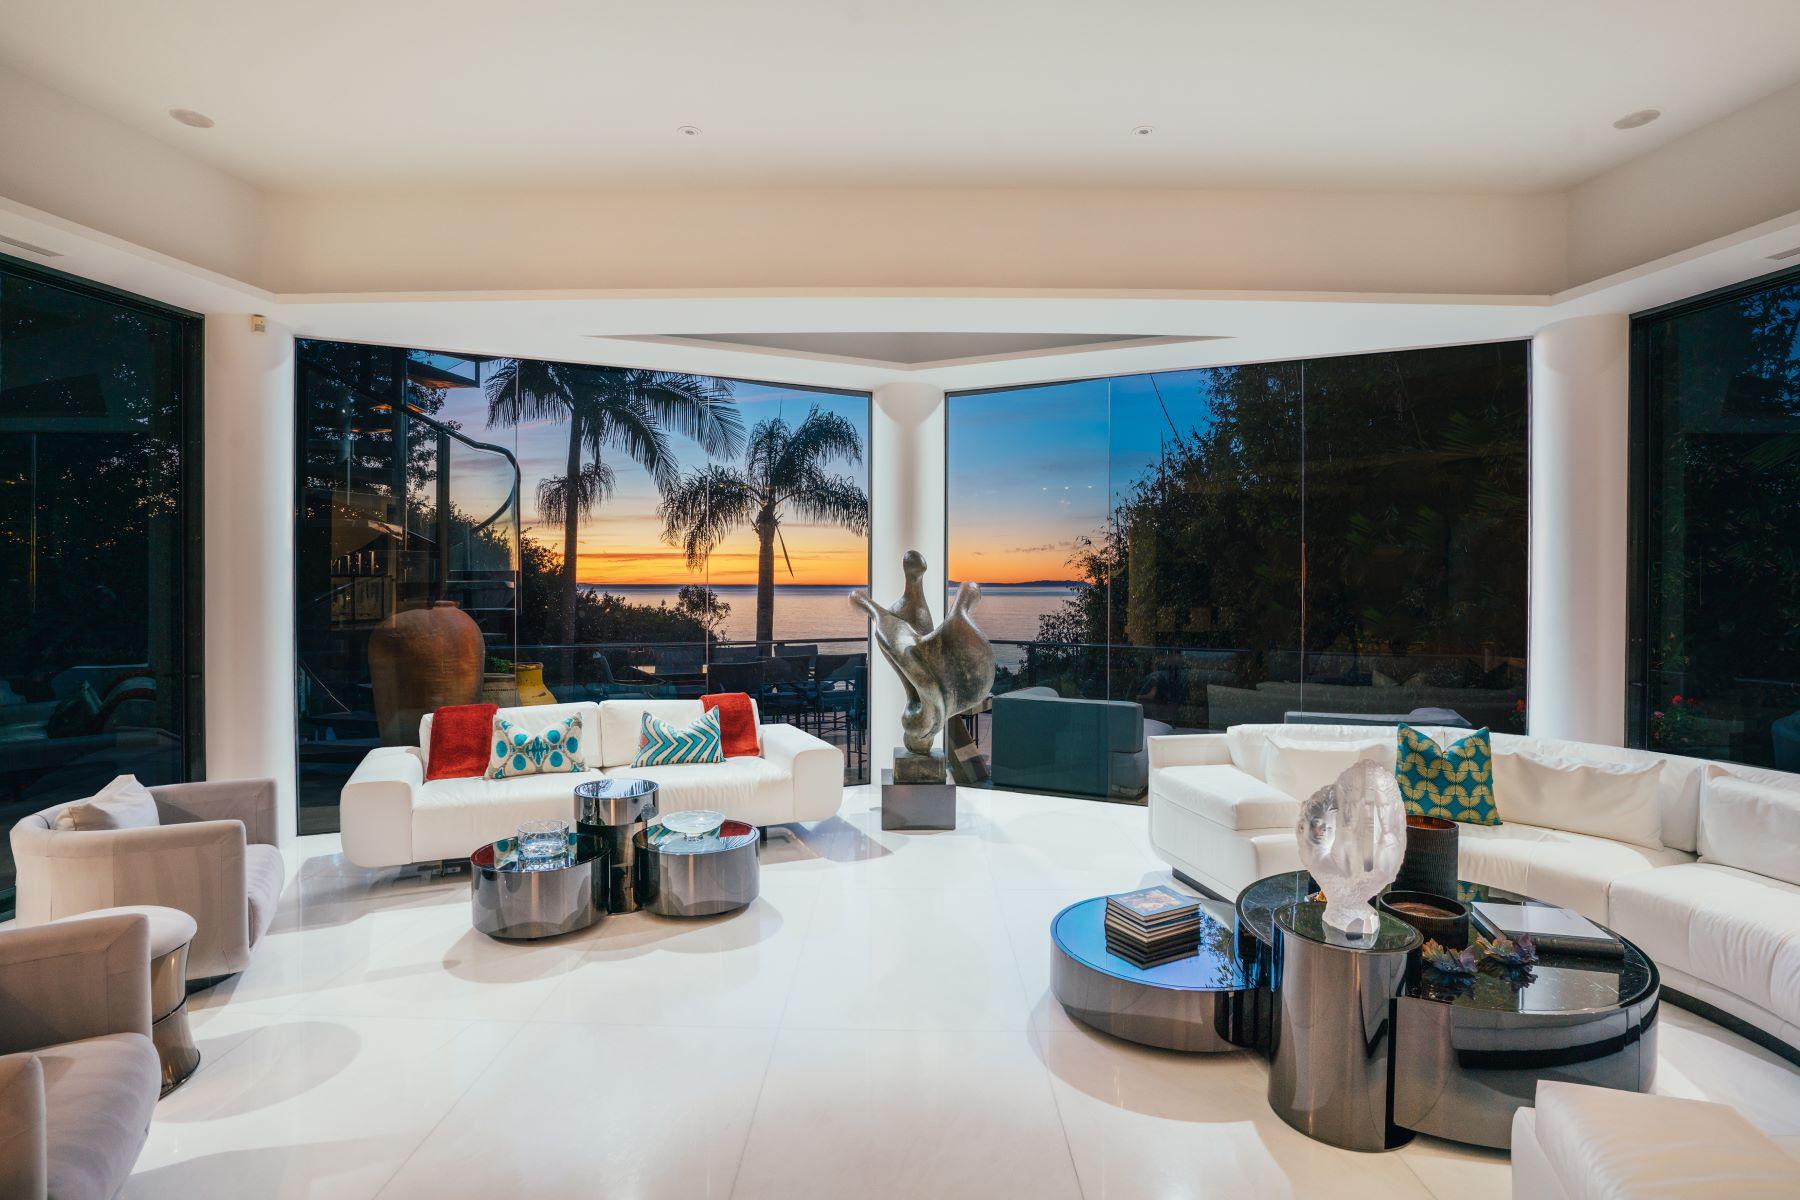 Additional photo for property listing at Mar de Amor 27930 Pacific Coast Highway, Malibu, Califórnia 90265 Estados Unidos